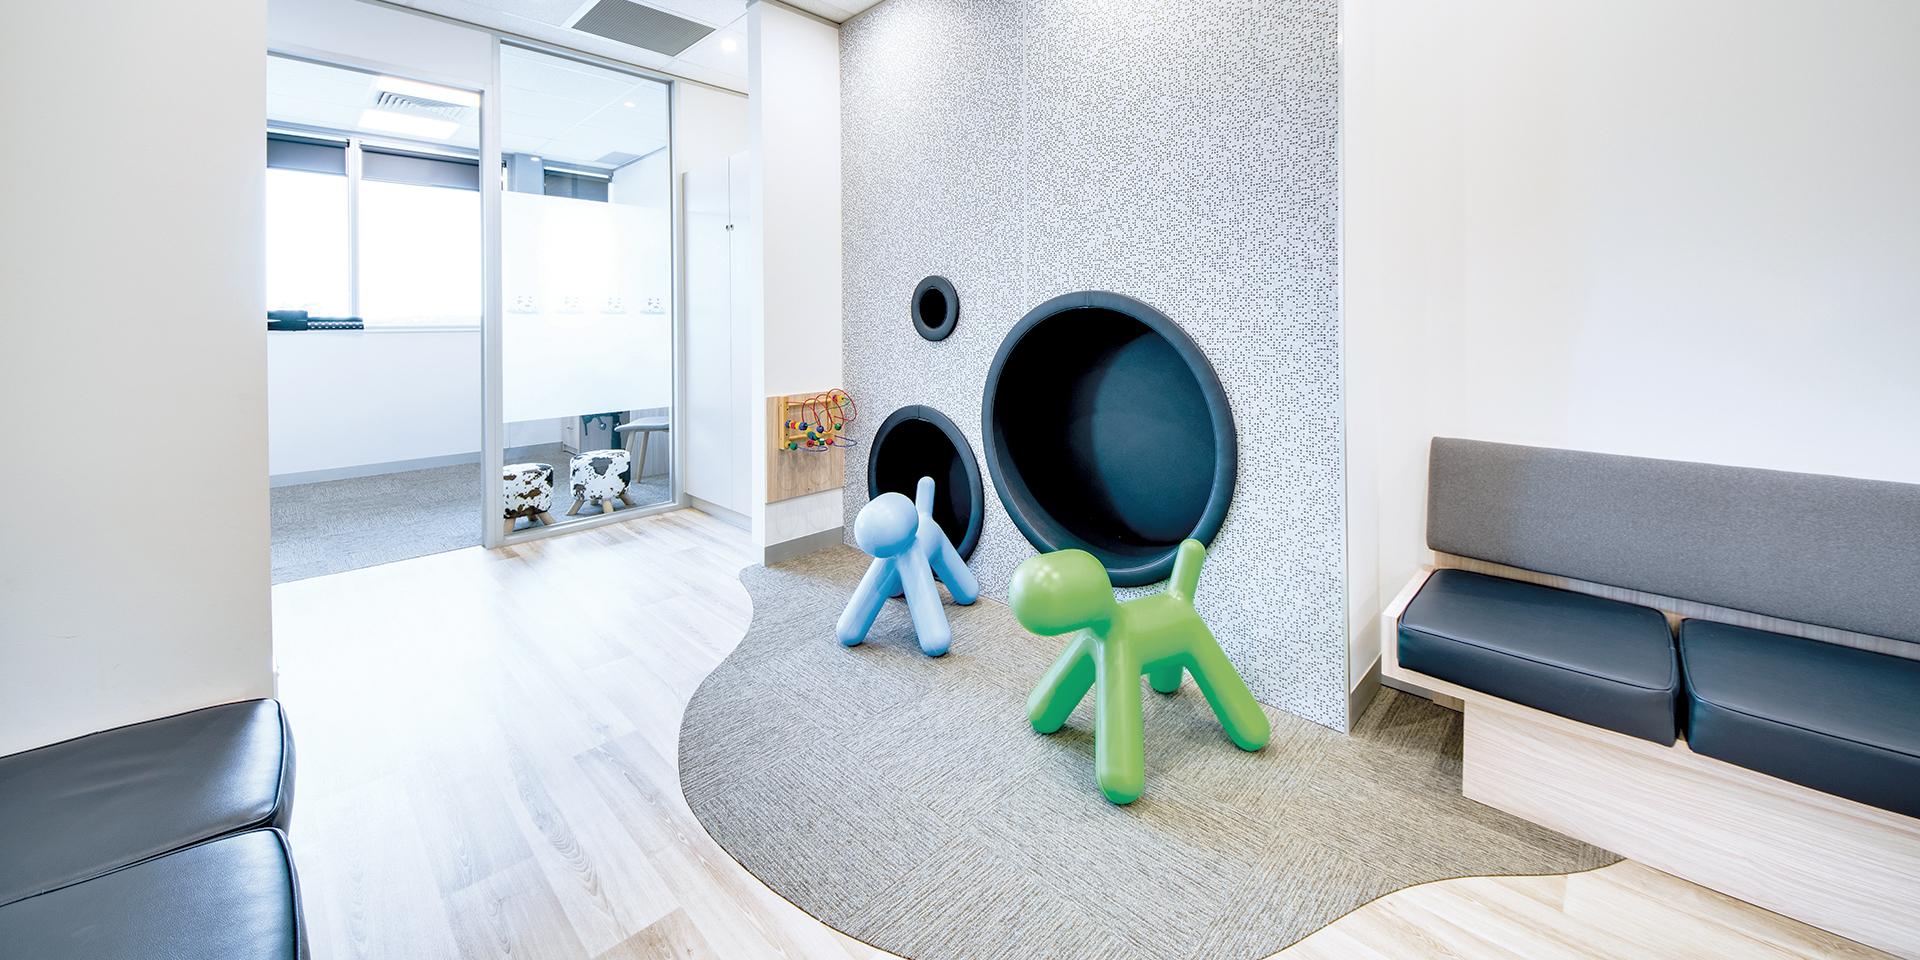 Dental Practice design waiting room